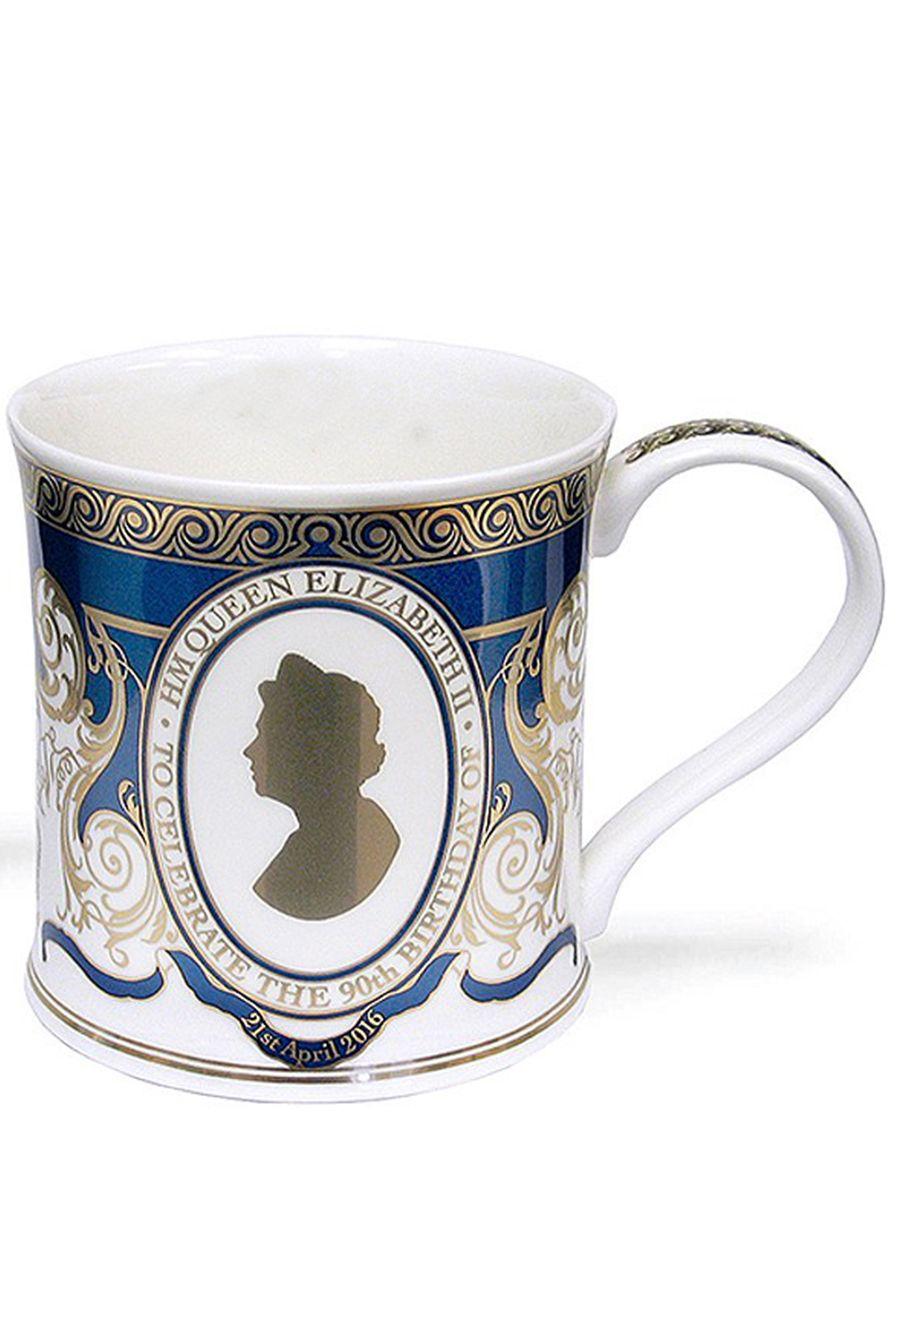 Dunoon Queen Elizabeth II 90th Birthday Commemorative 22ct Gold Mug at BBC Shop